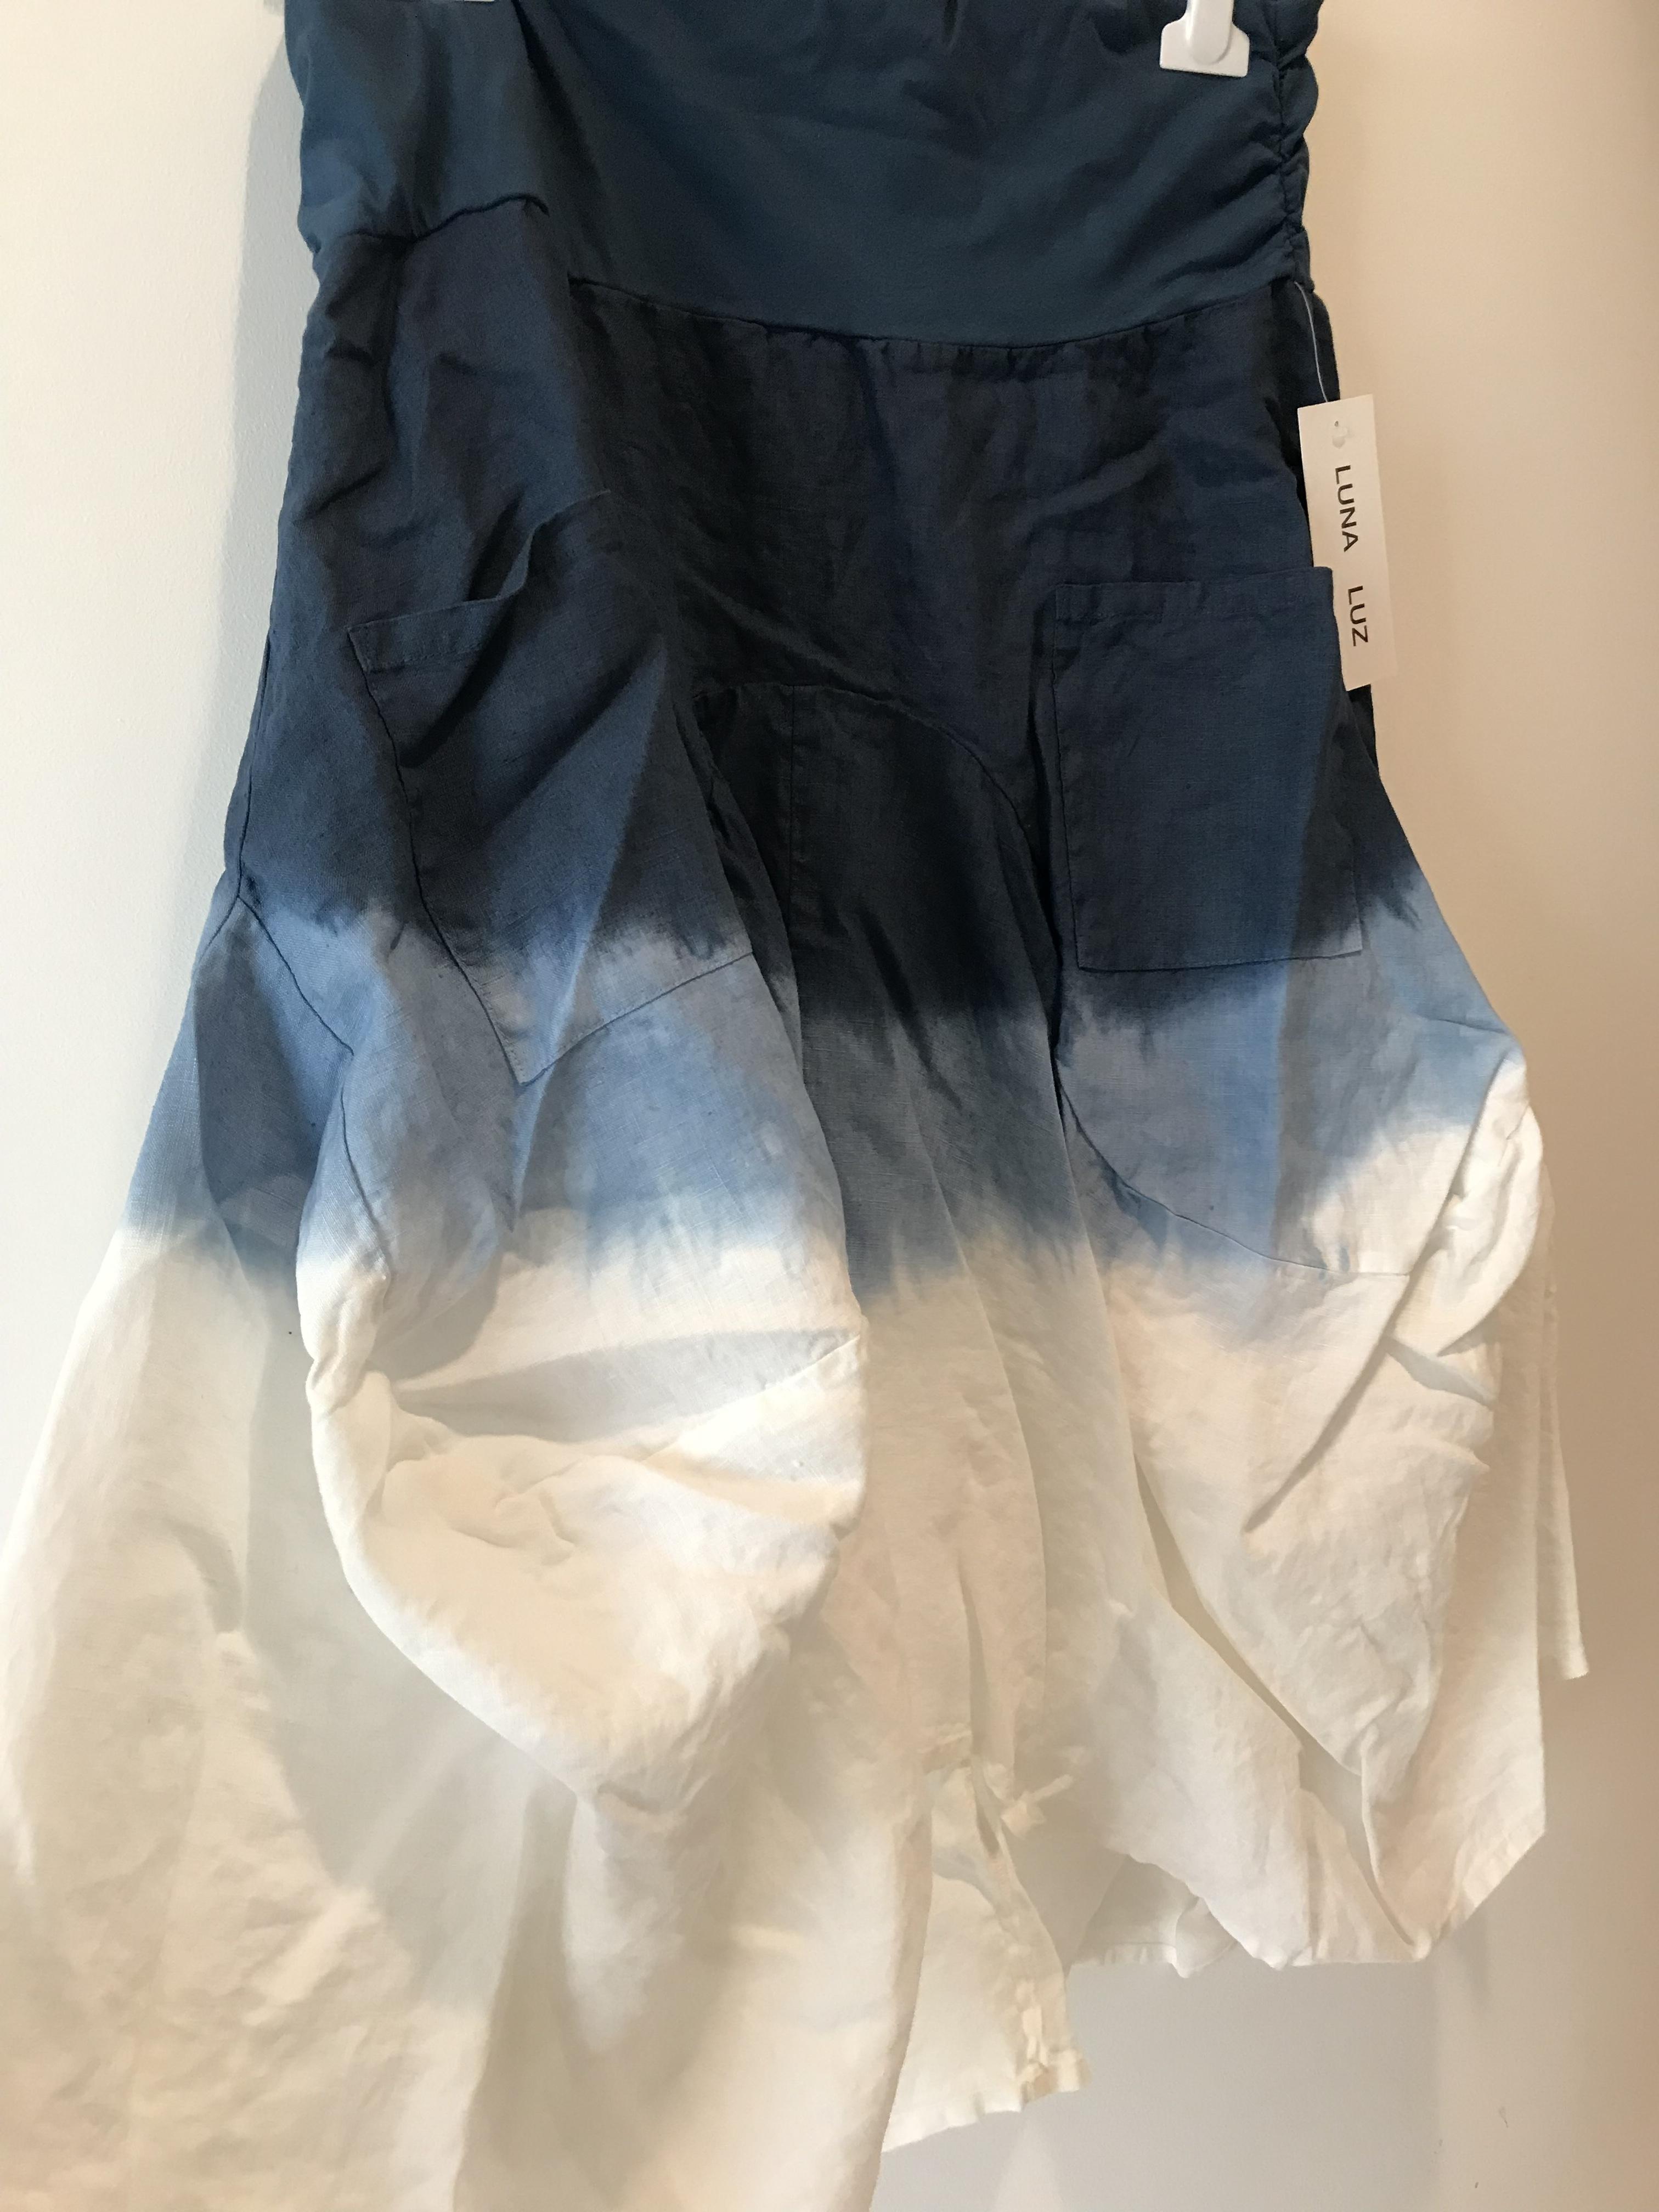 Luna Luz: Swivel Hemline Linen Midi Pocket Skirt With Ties (Ships Immed in Navy Ombre, 1 Left!) LL_734T_Navy_Ombre